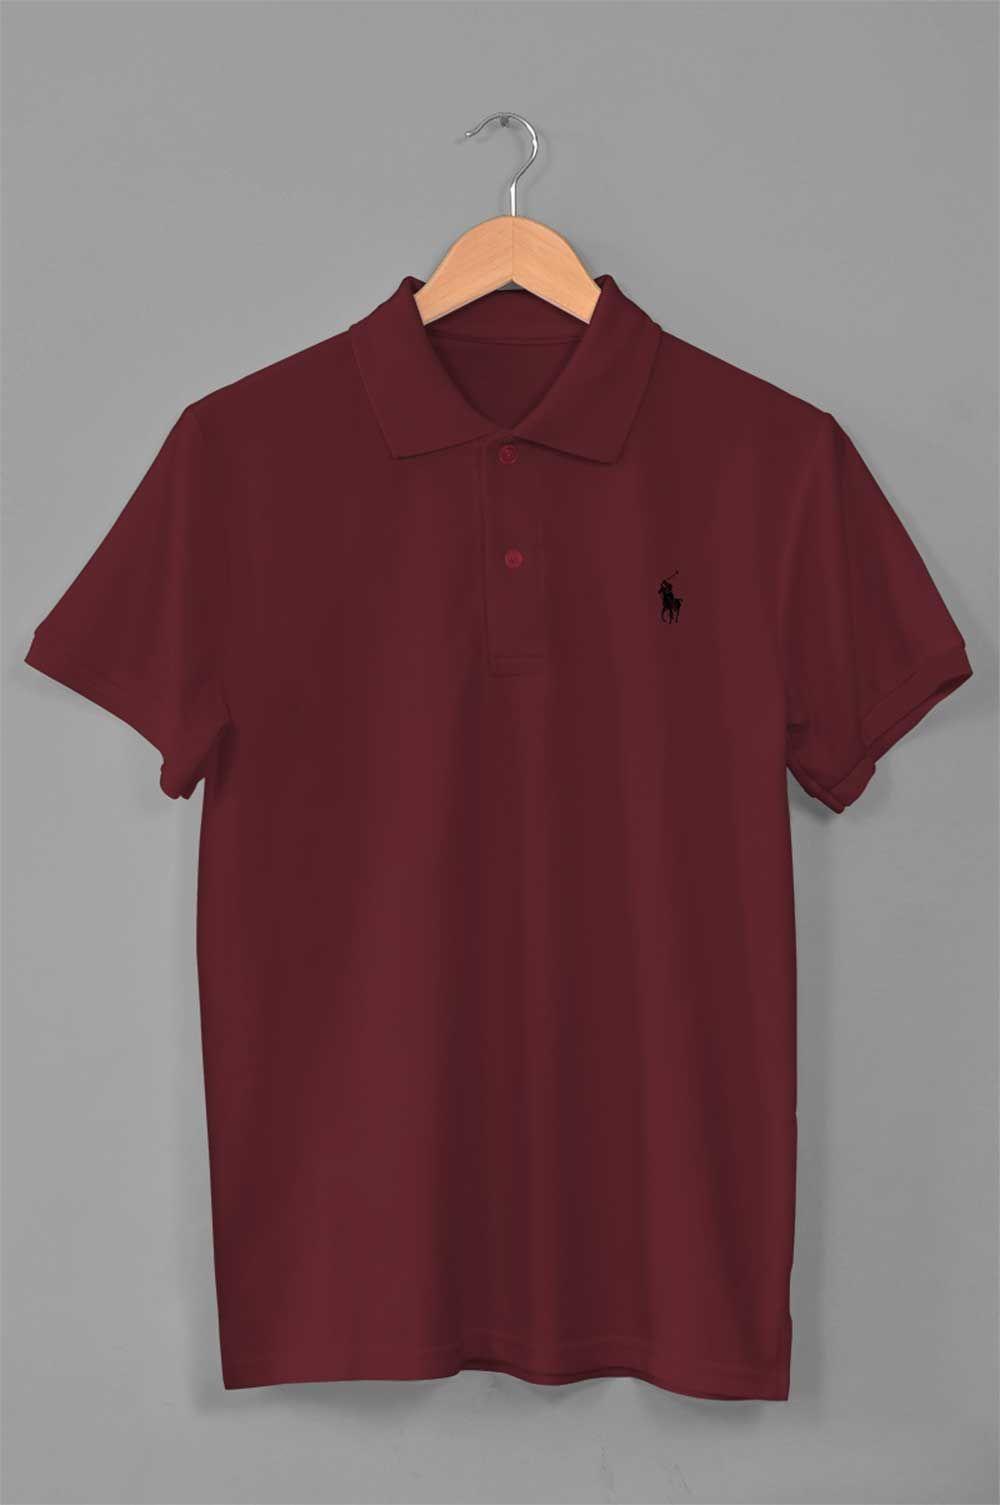 Download Free Download Polo Shirt Mockup Polo Shirt Mockup Shirt Mockup Shirts Polo Shirt